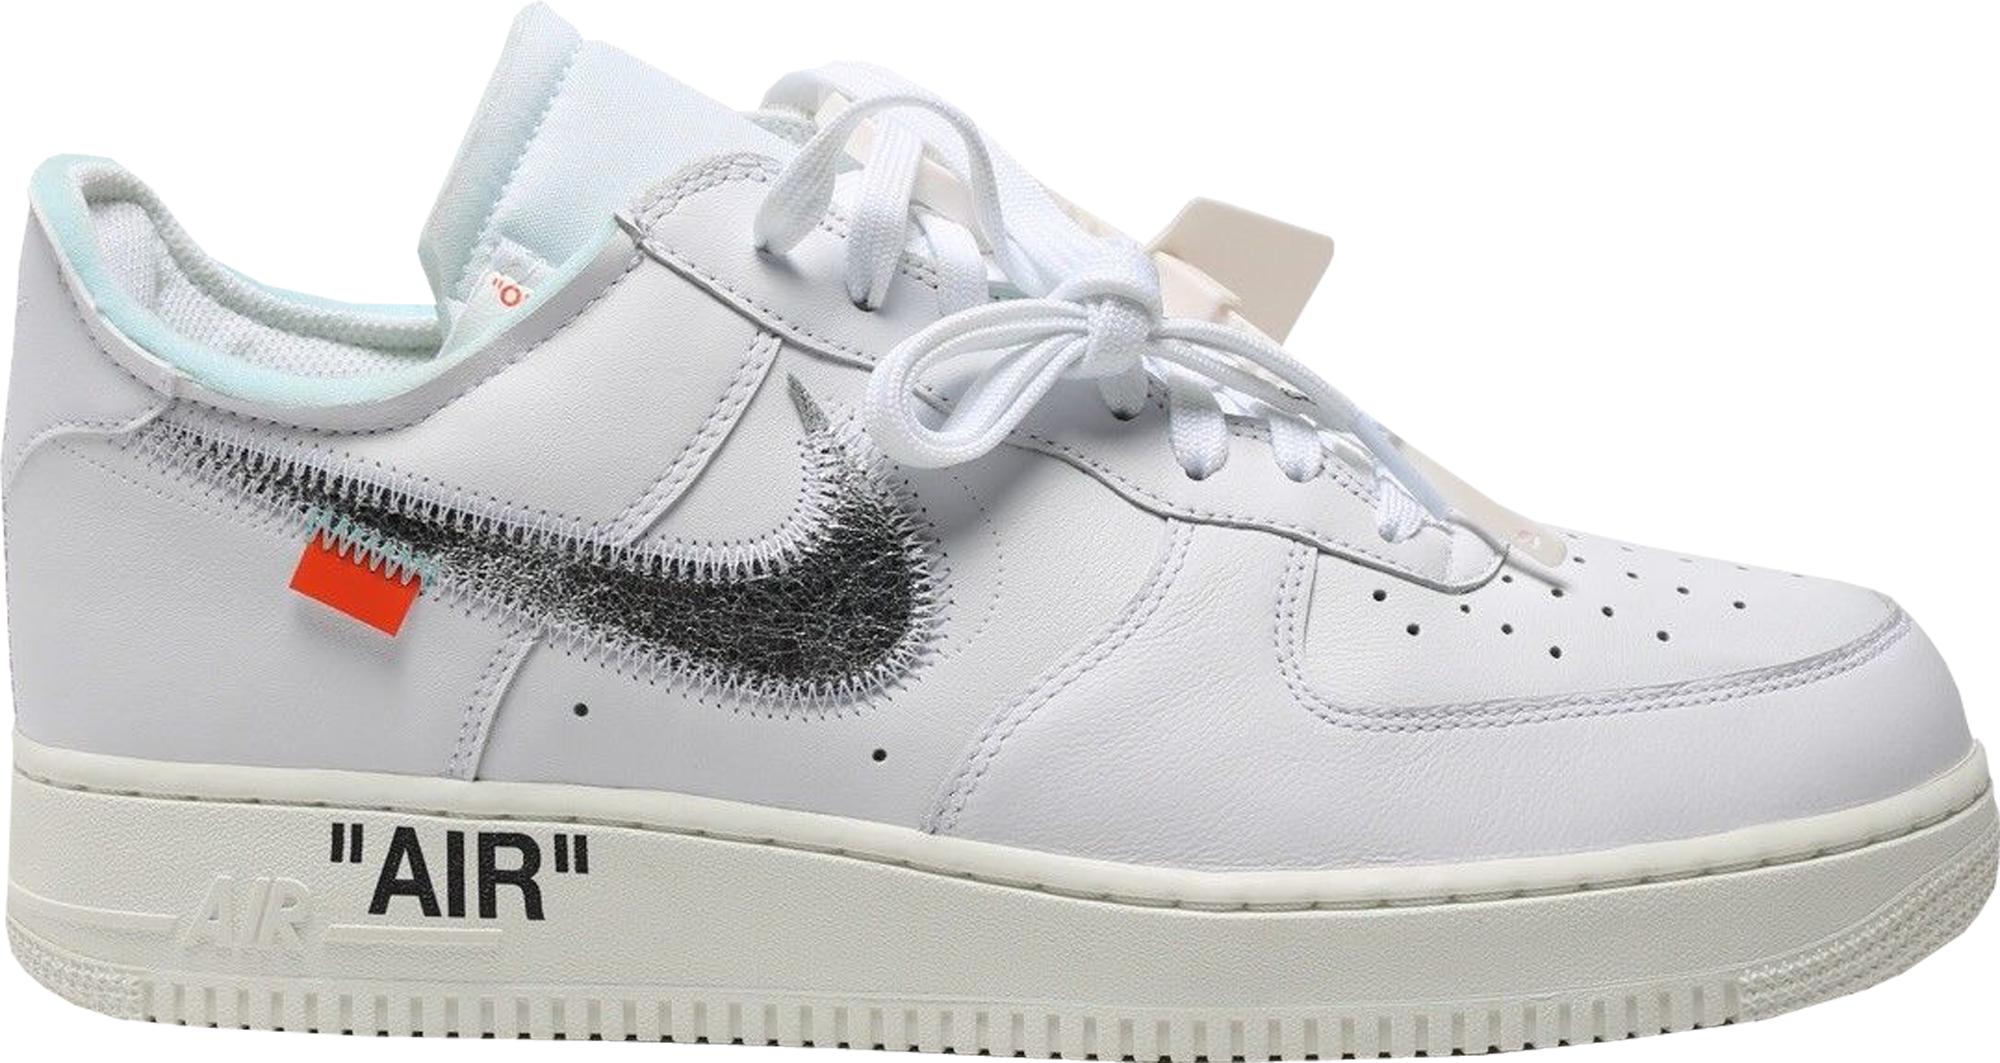 nike air force x off white